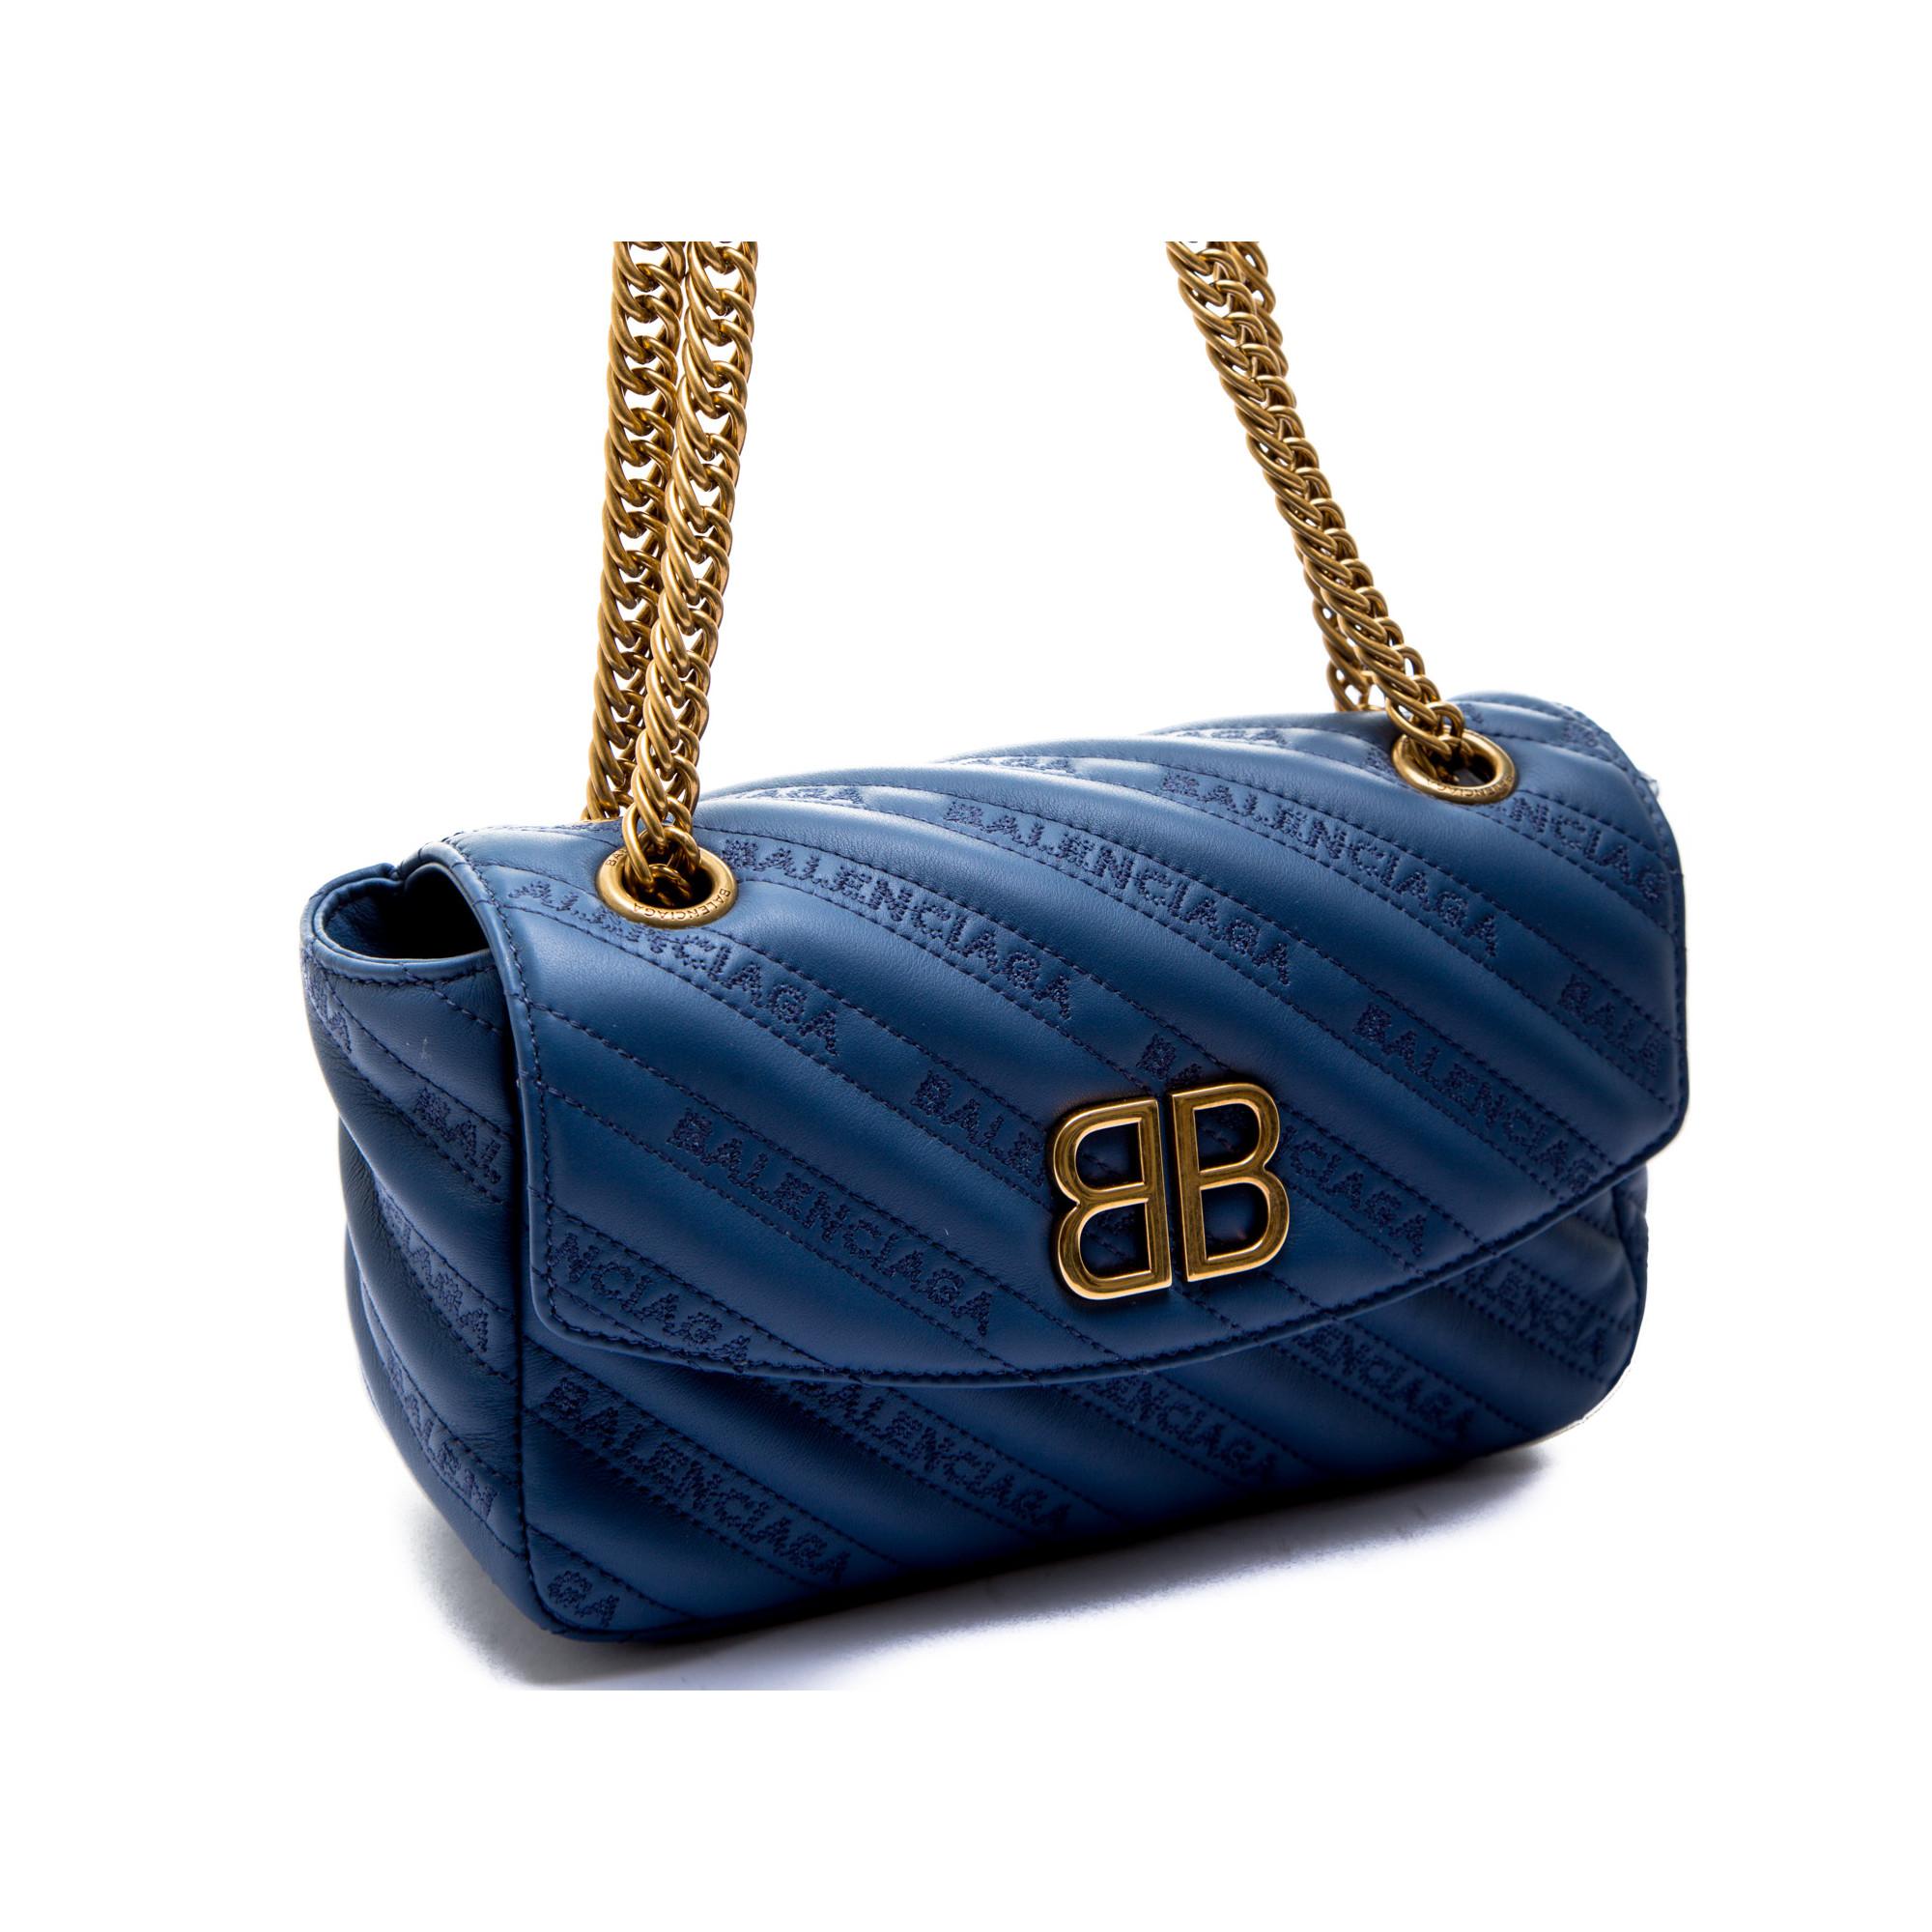 BB Round S bag Balenciaga CWchbjO